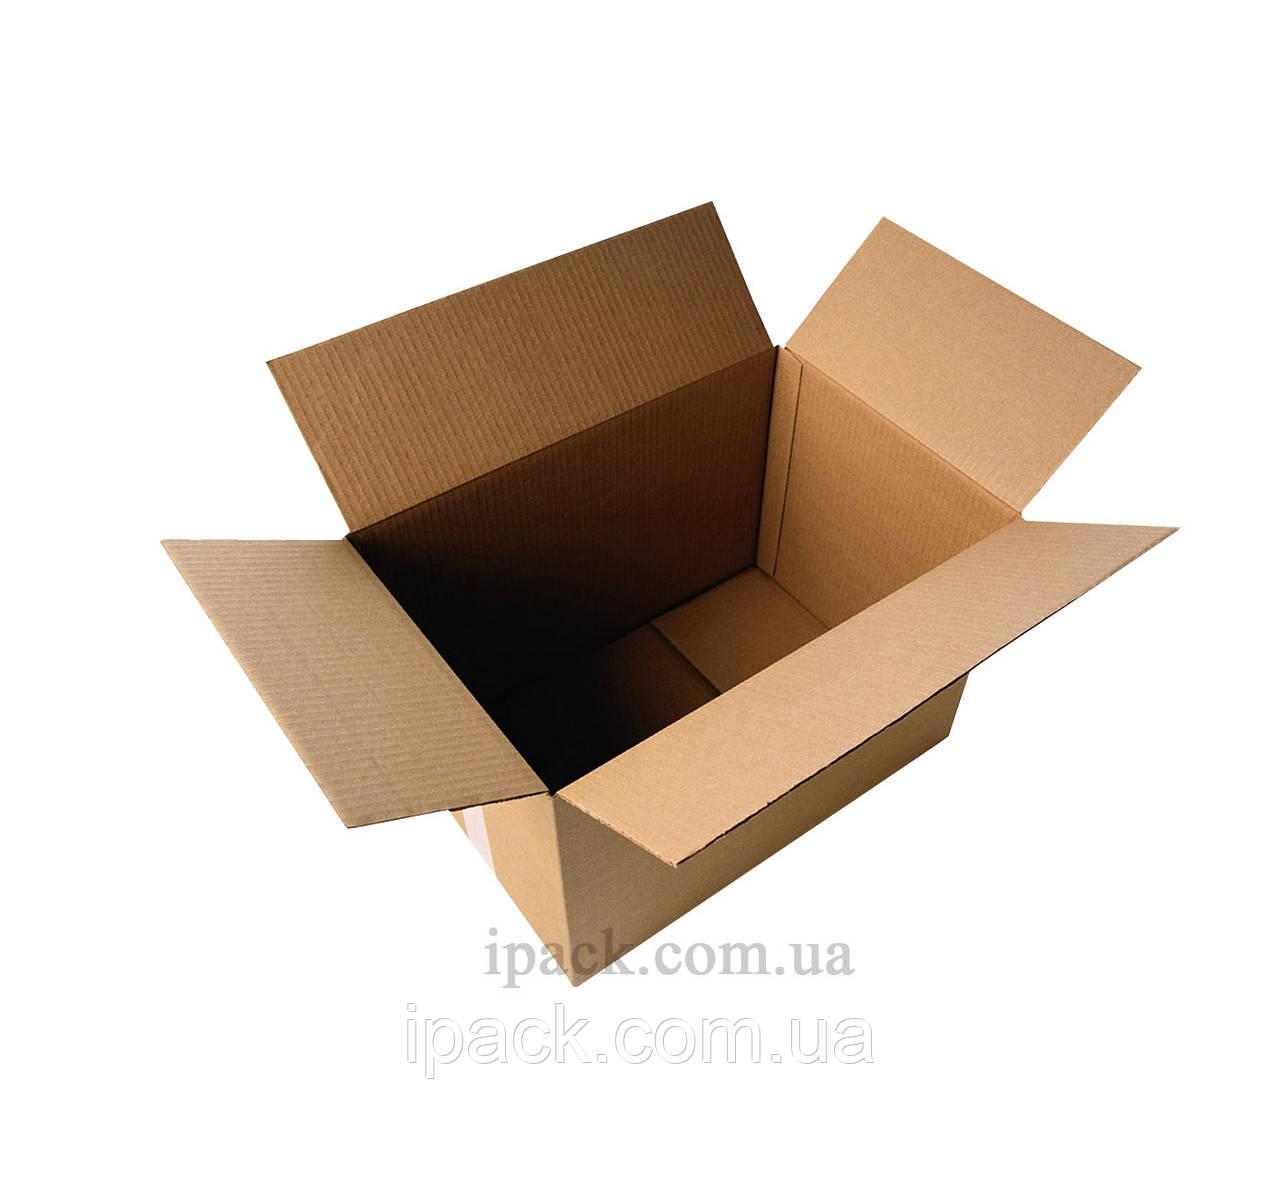 Гофроящик 550*295*325 мм, бурый, четырехклапанный картонный короб